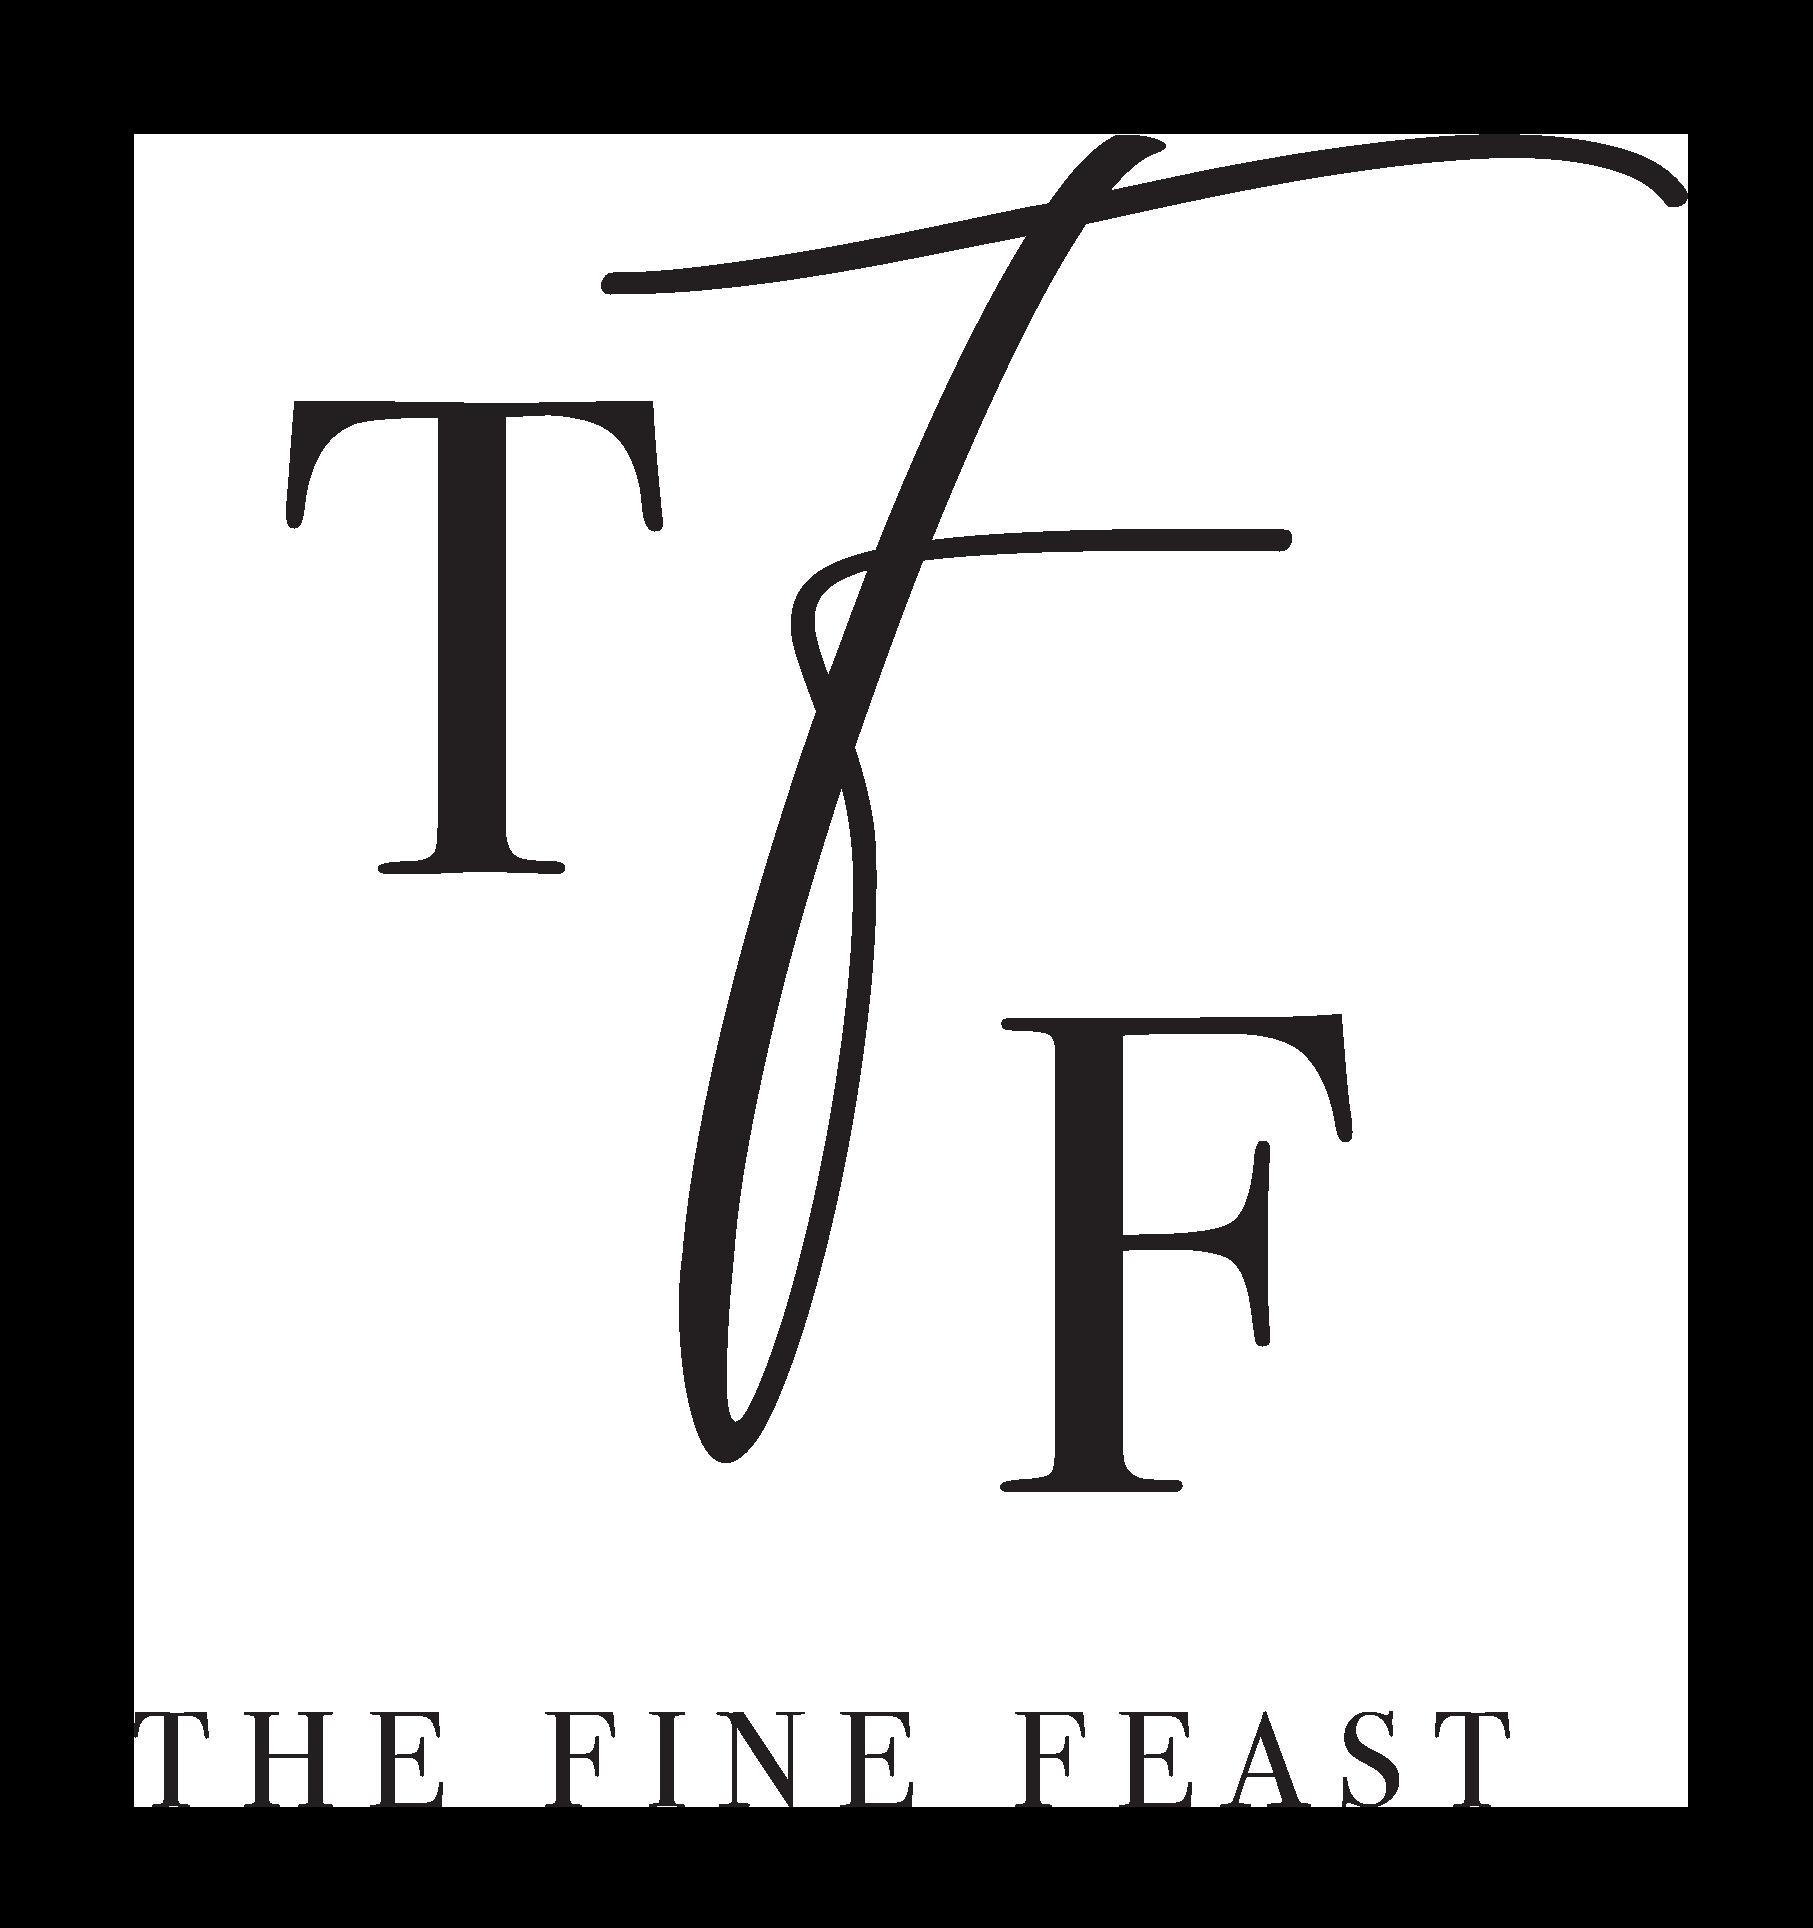 Logo Design for The Fine Feast